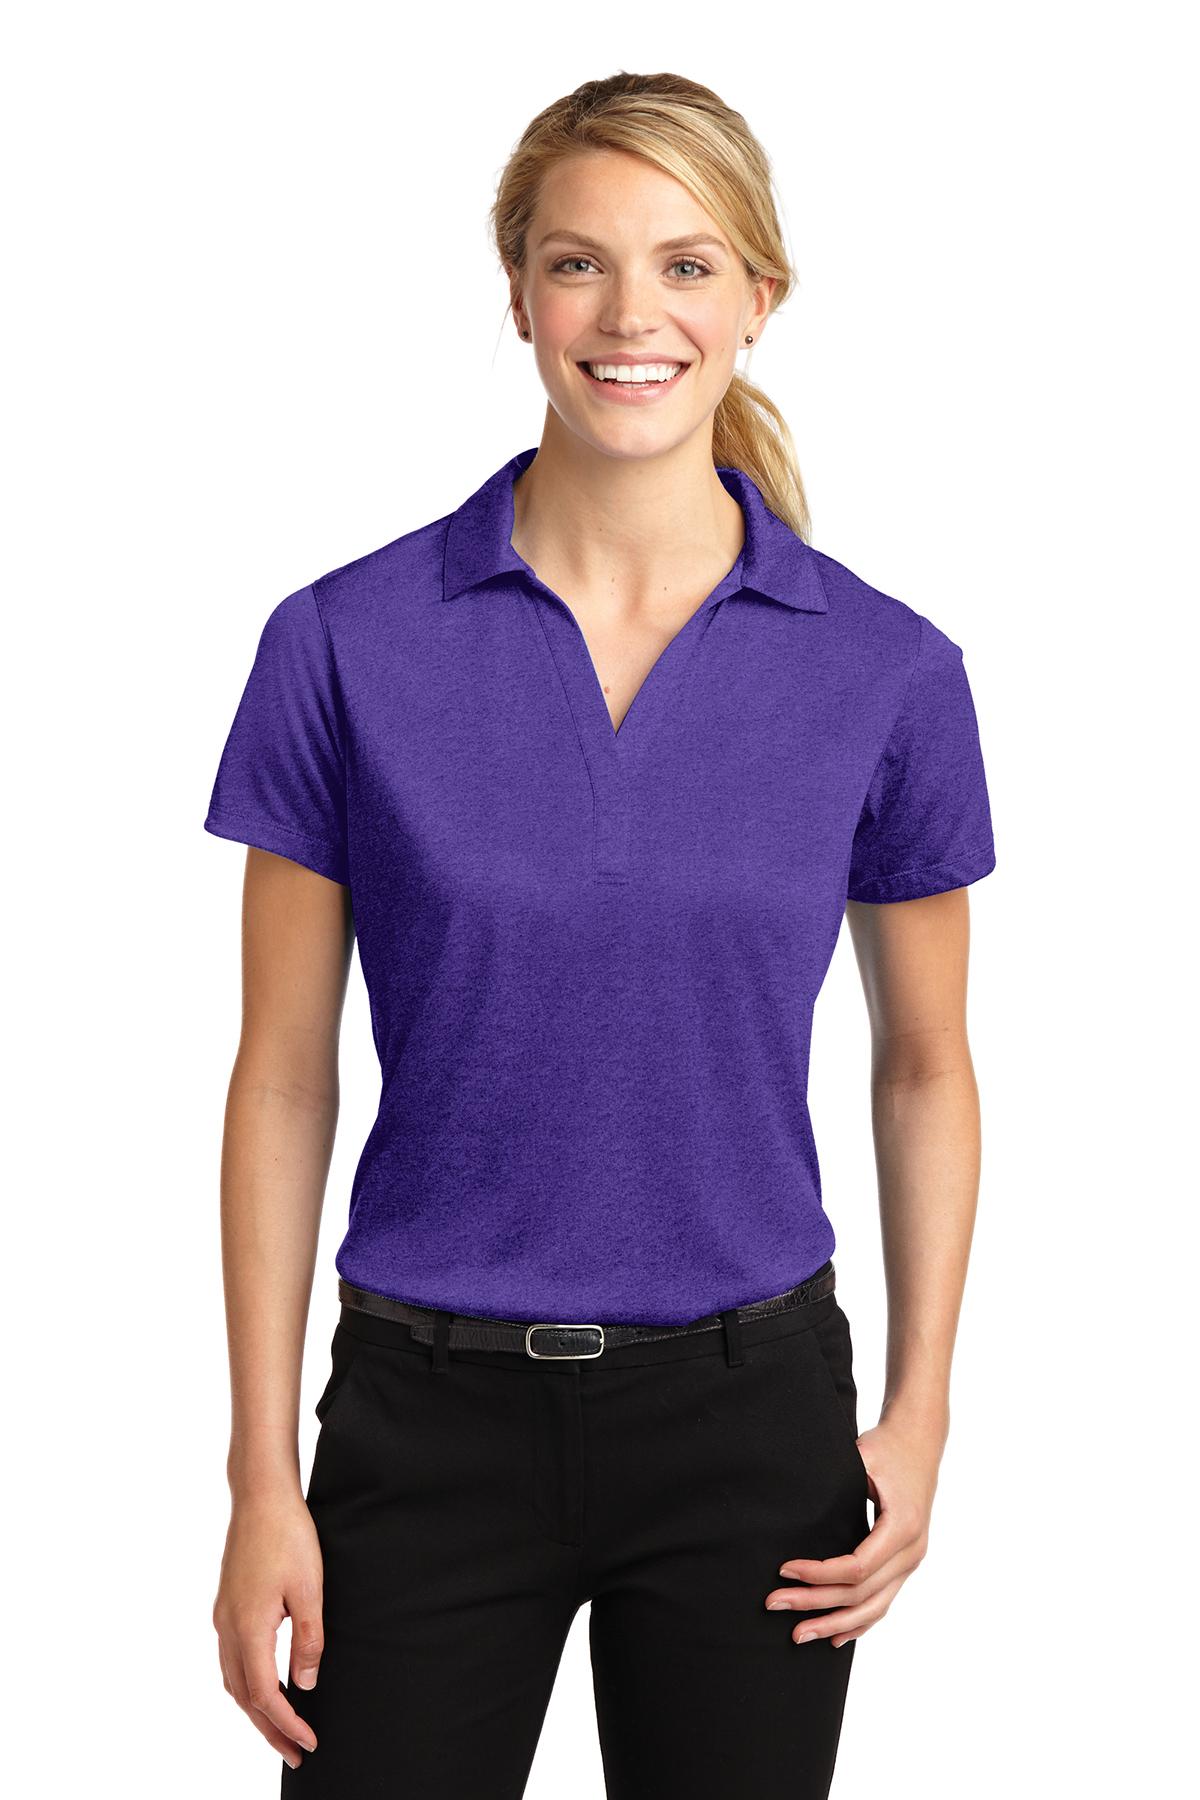 72340da97938 Womens Polo Shirts Old Navy - DREAMWORKS